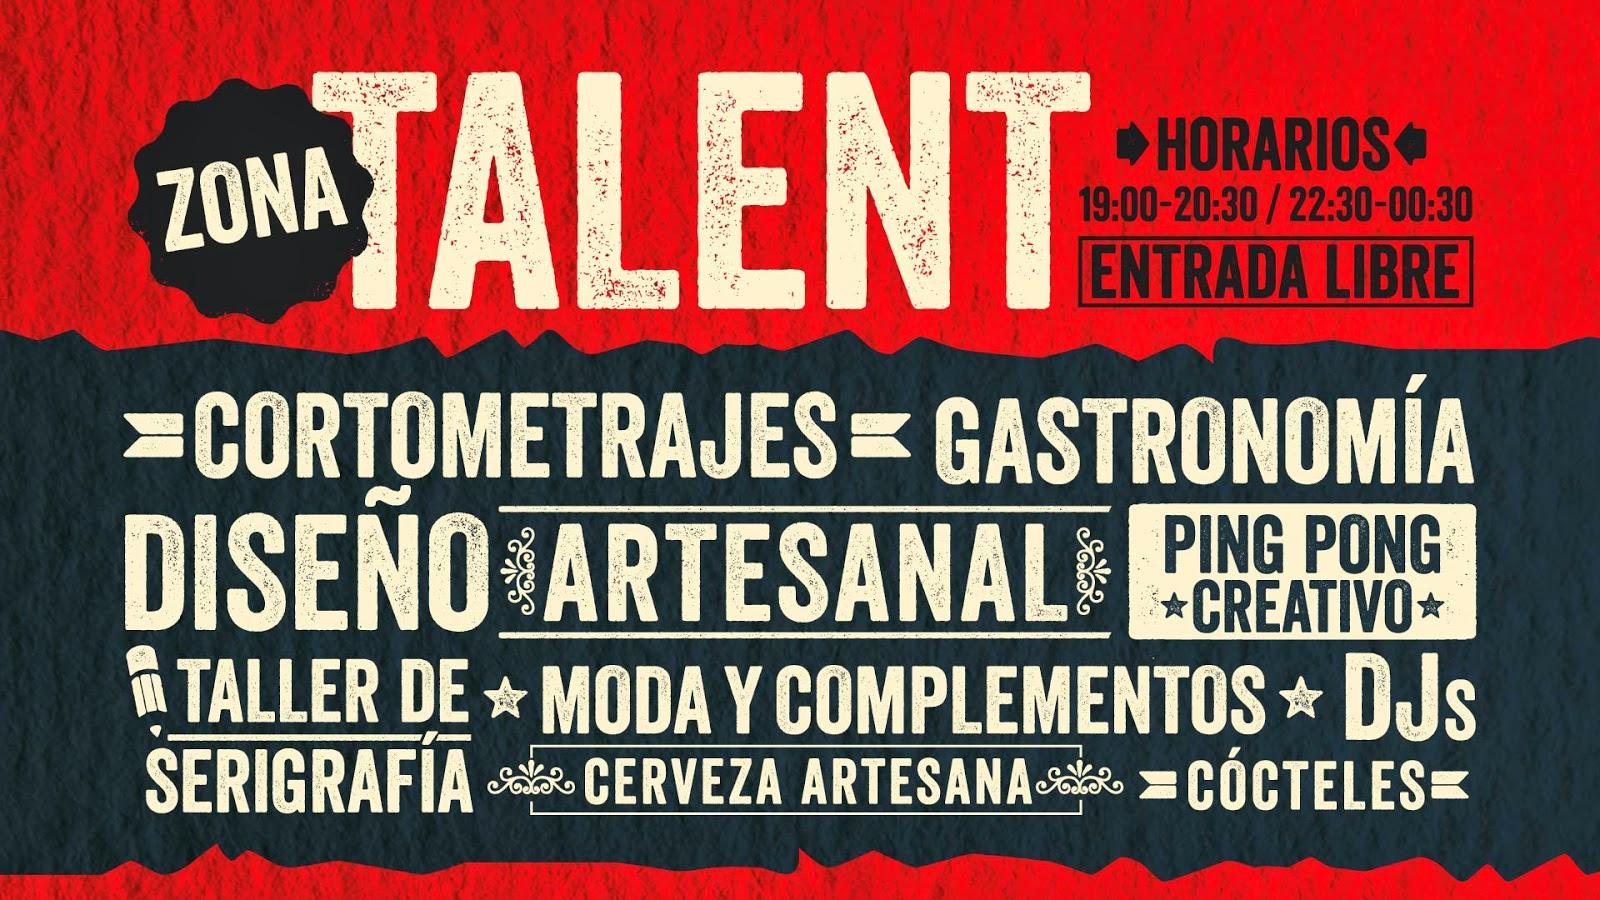 http://talentmadrid.teatroscanal.com/zona-talent/